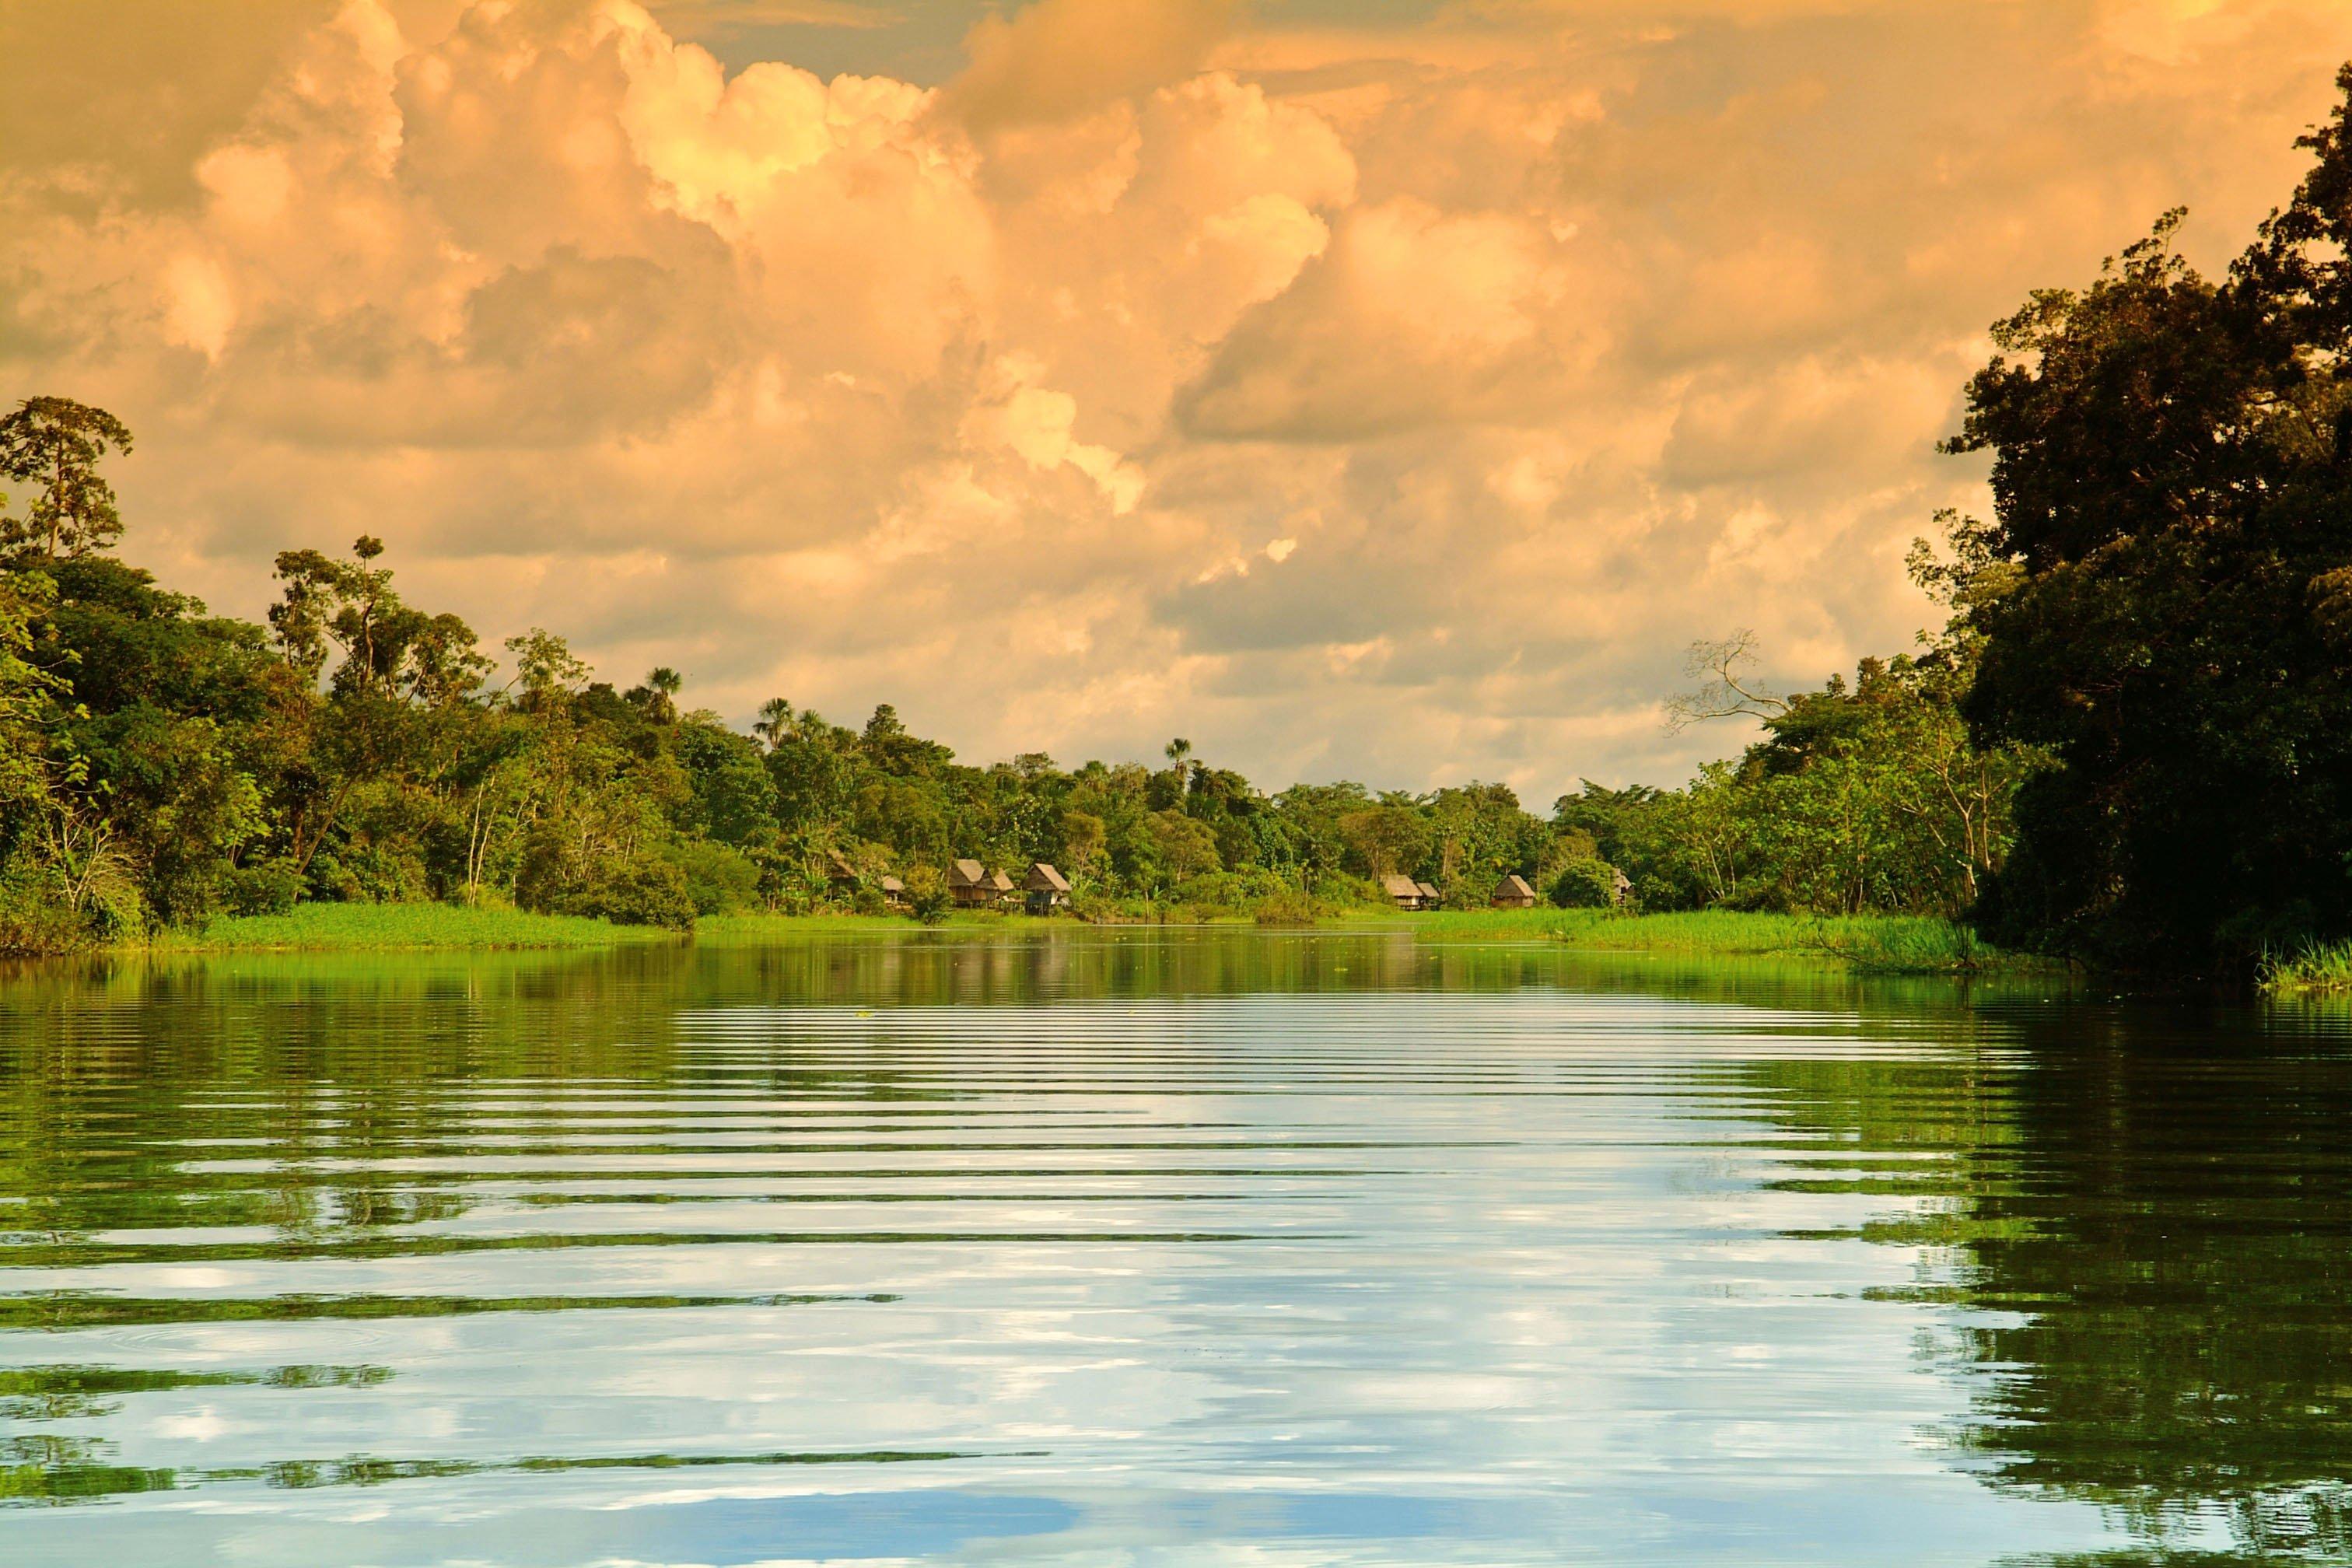 dawn-on-amazon-river-peru